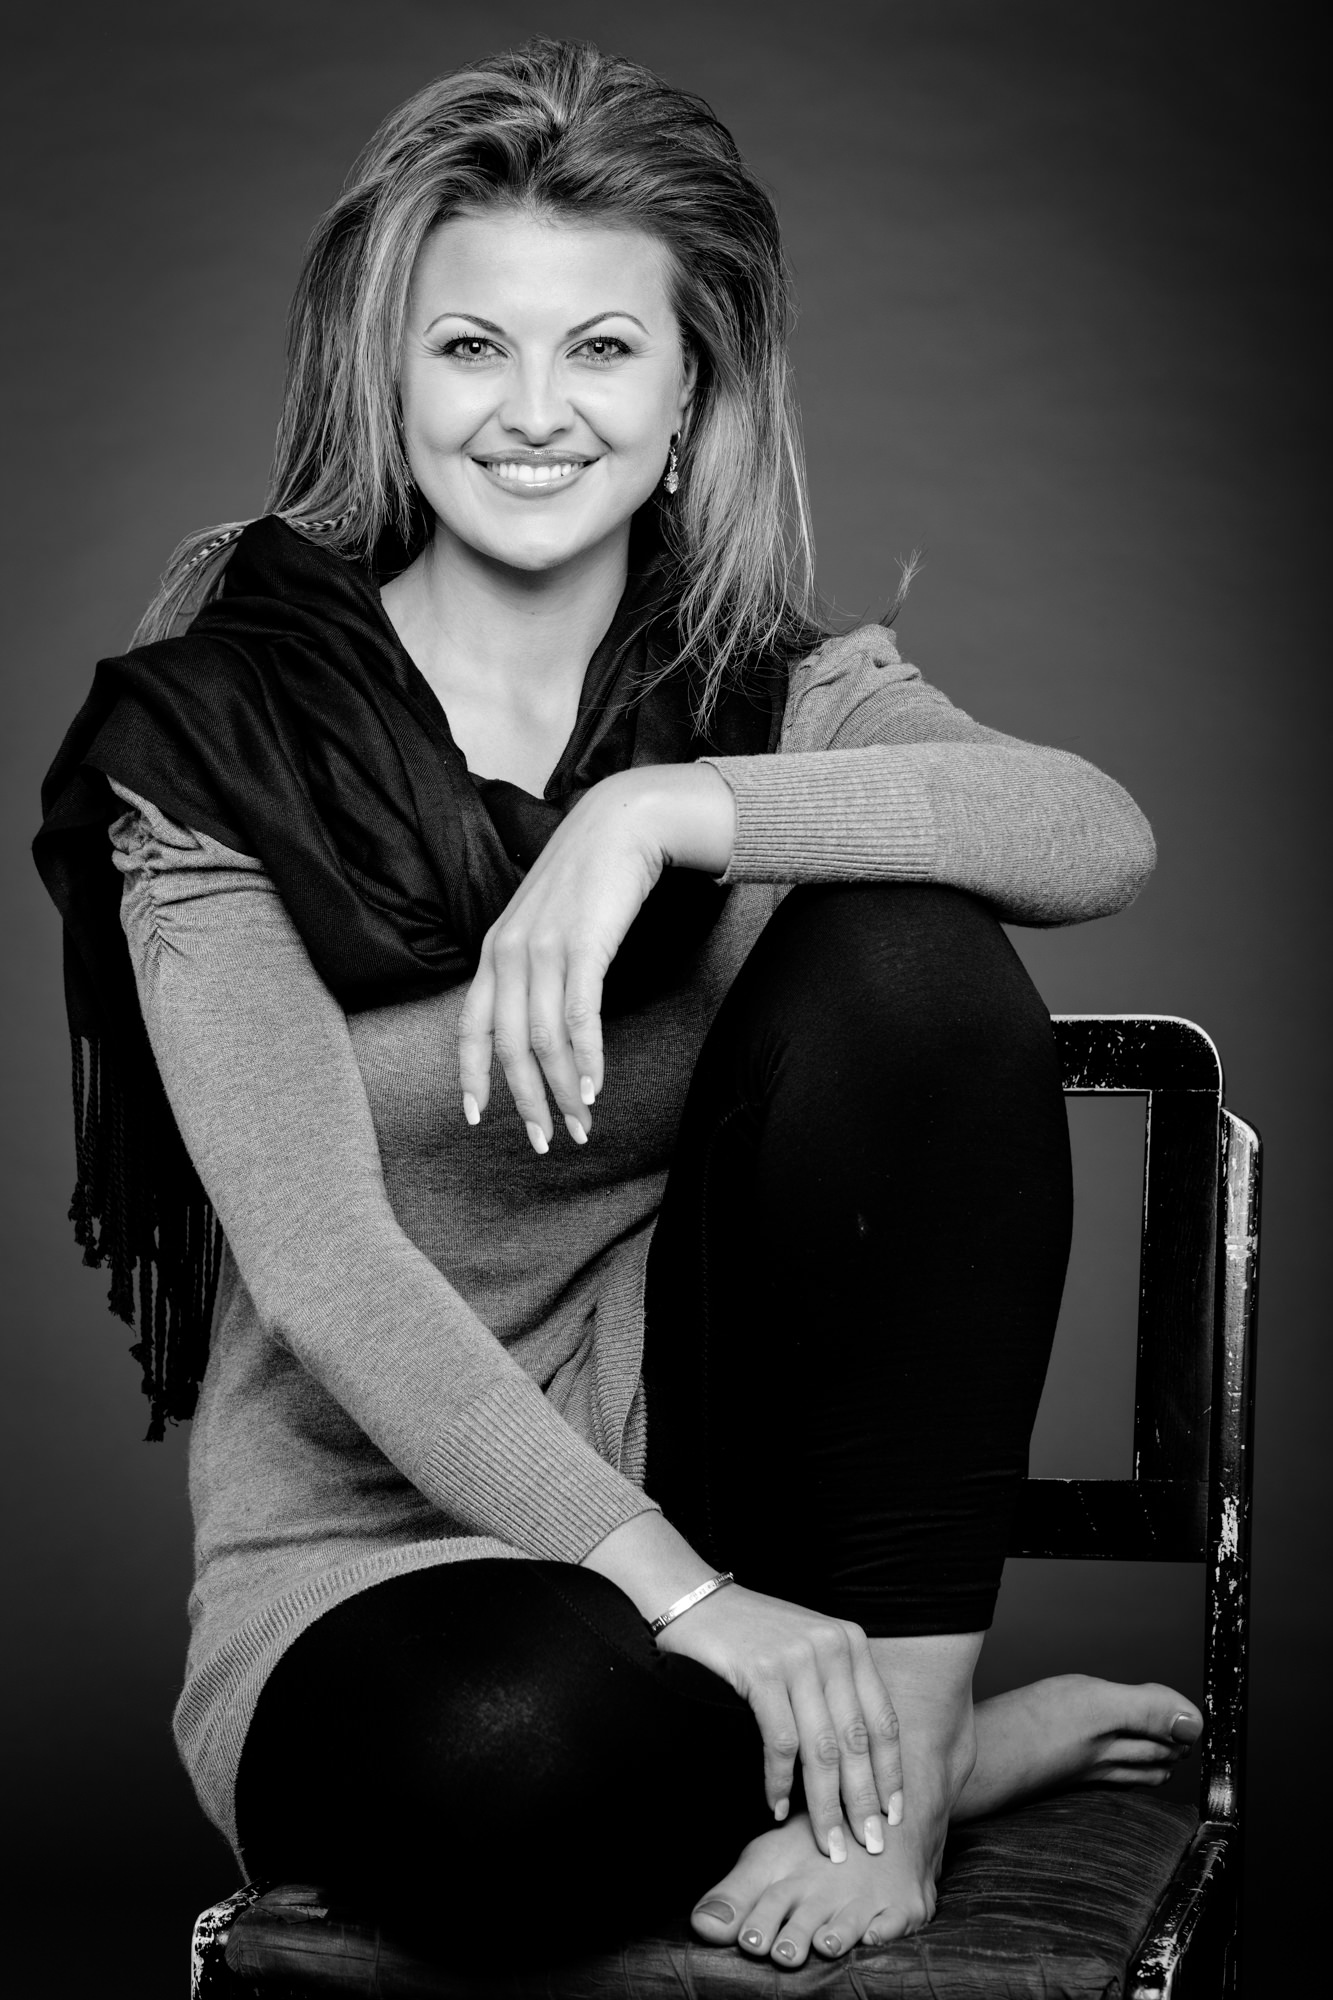 tim gerges portrait photographer charlene--3.jpg